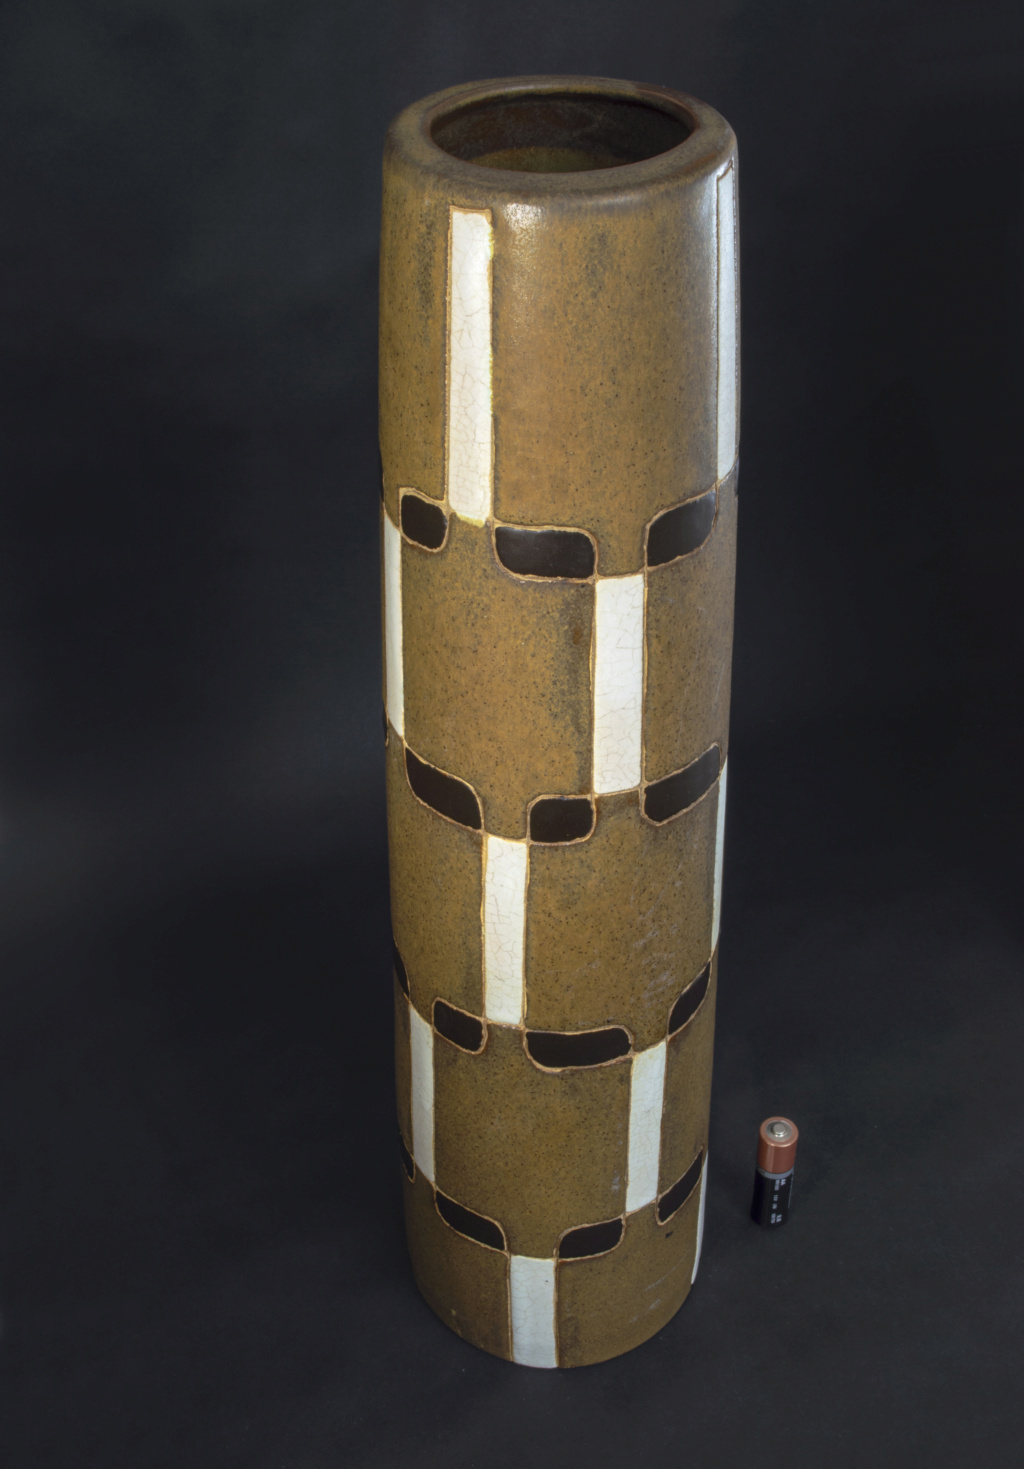 Tall Brown Cylinder Grid Pattern Ceramic Vase (something or nothing?) Dsc_0014